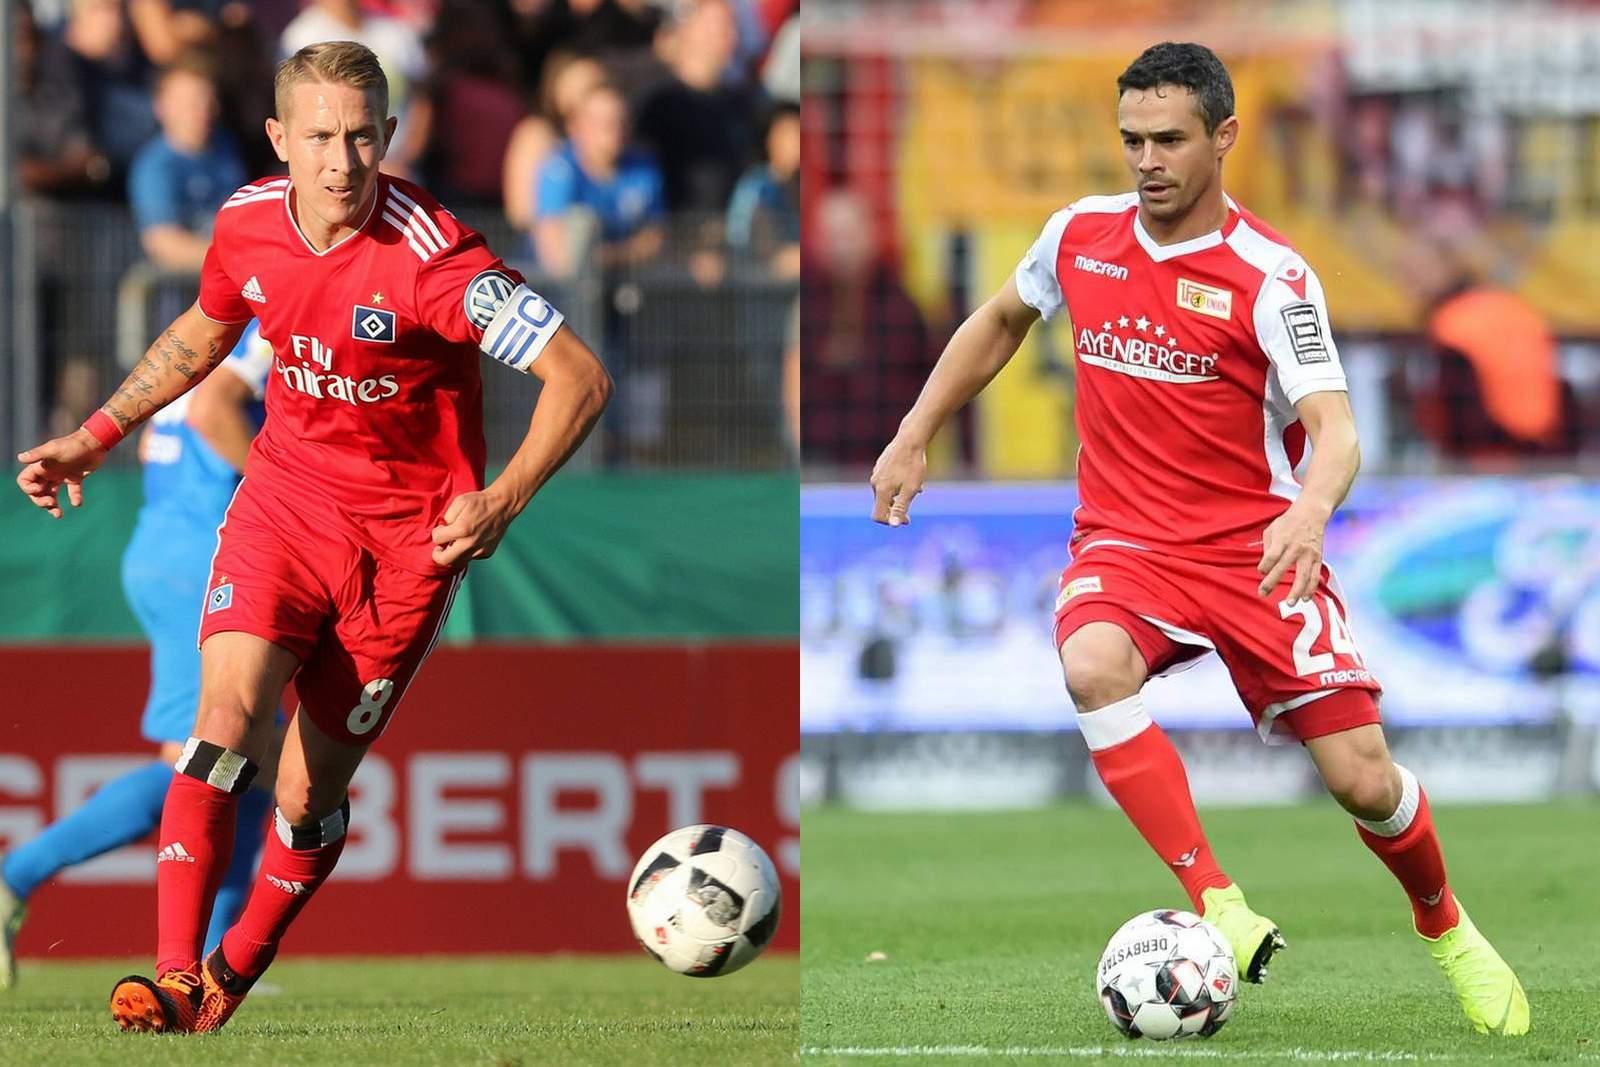 Hsv Vs Union Berlin Analyse Aufstellung 2018 2liga Liga